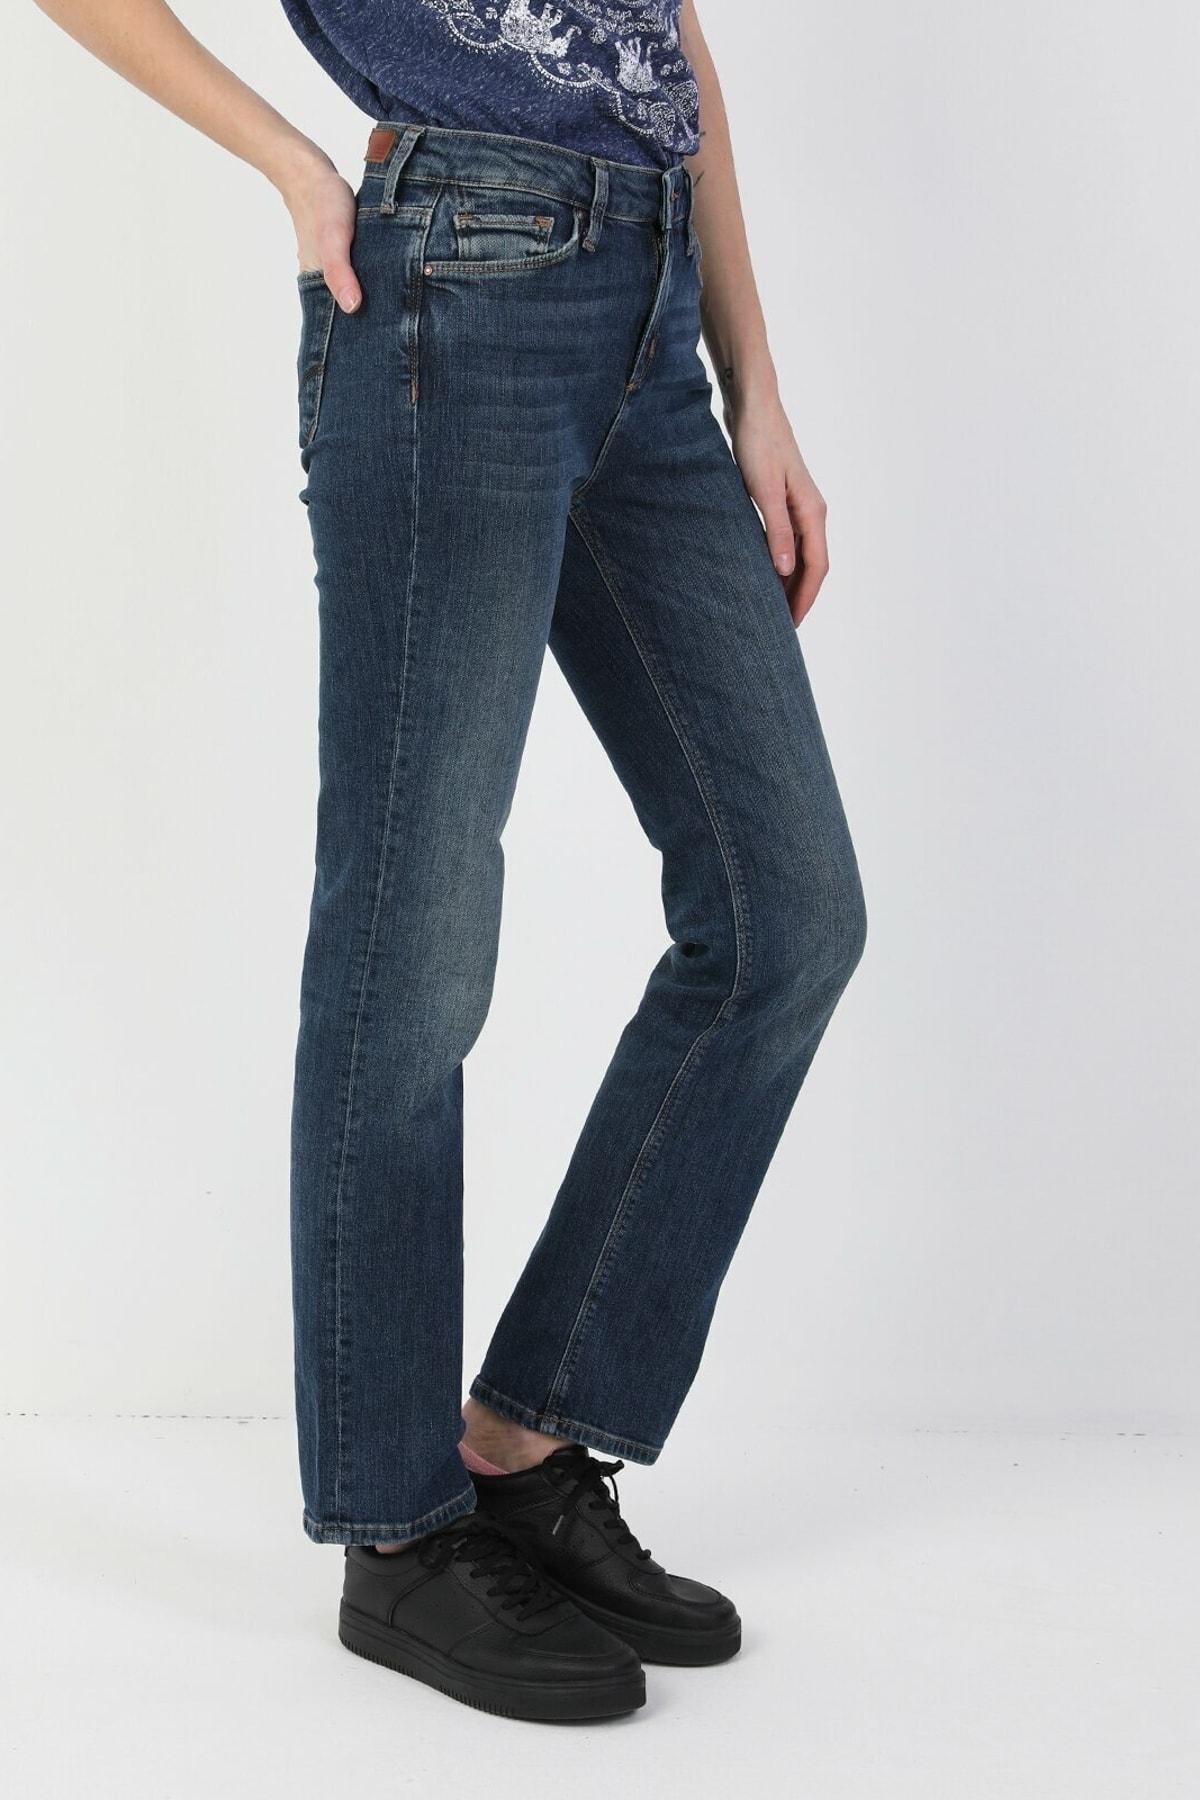 Colin's 792 Mila Normal Kesim Normal Bel Düz Paça Mavi Kadın Pantolon CL1048932 1